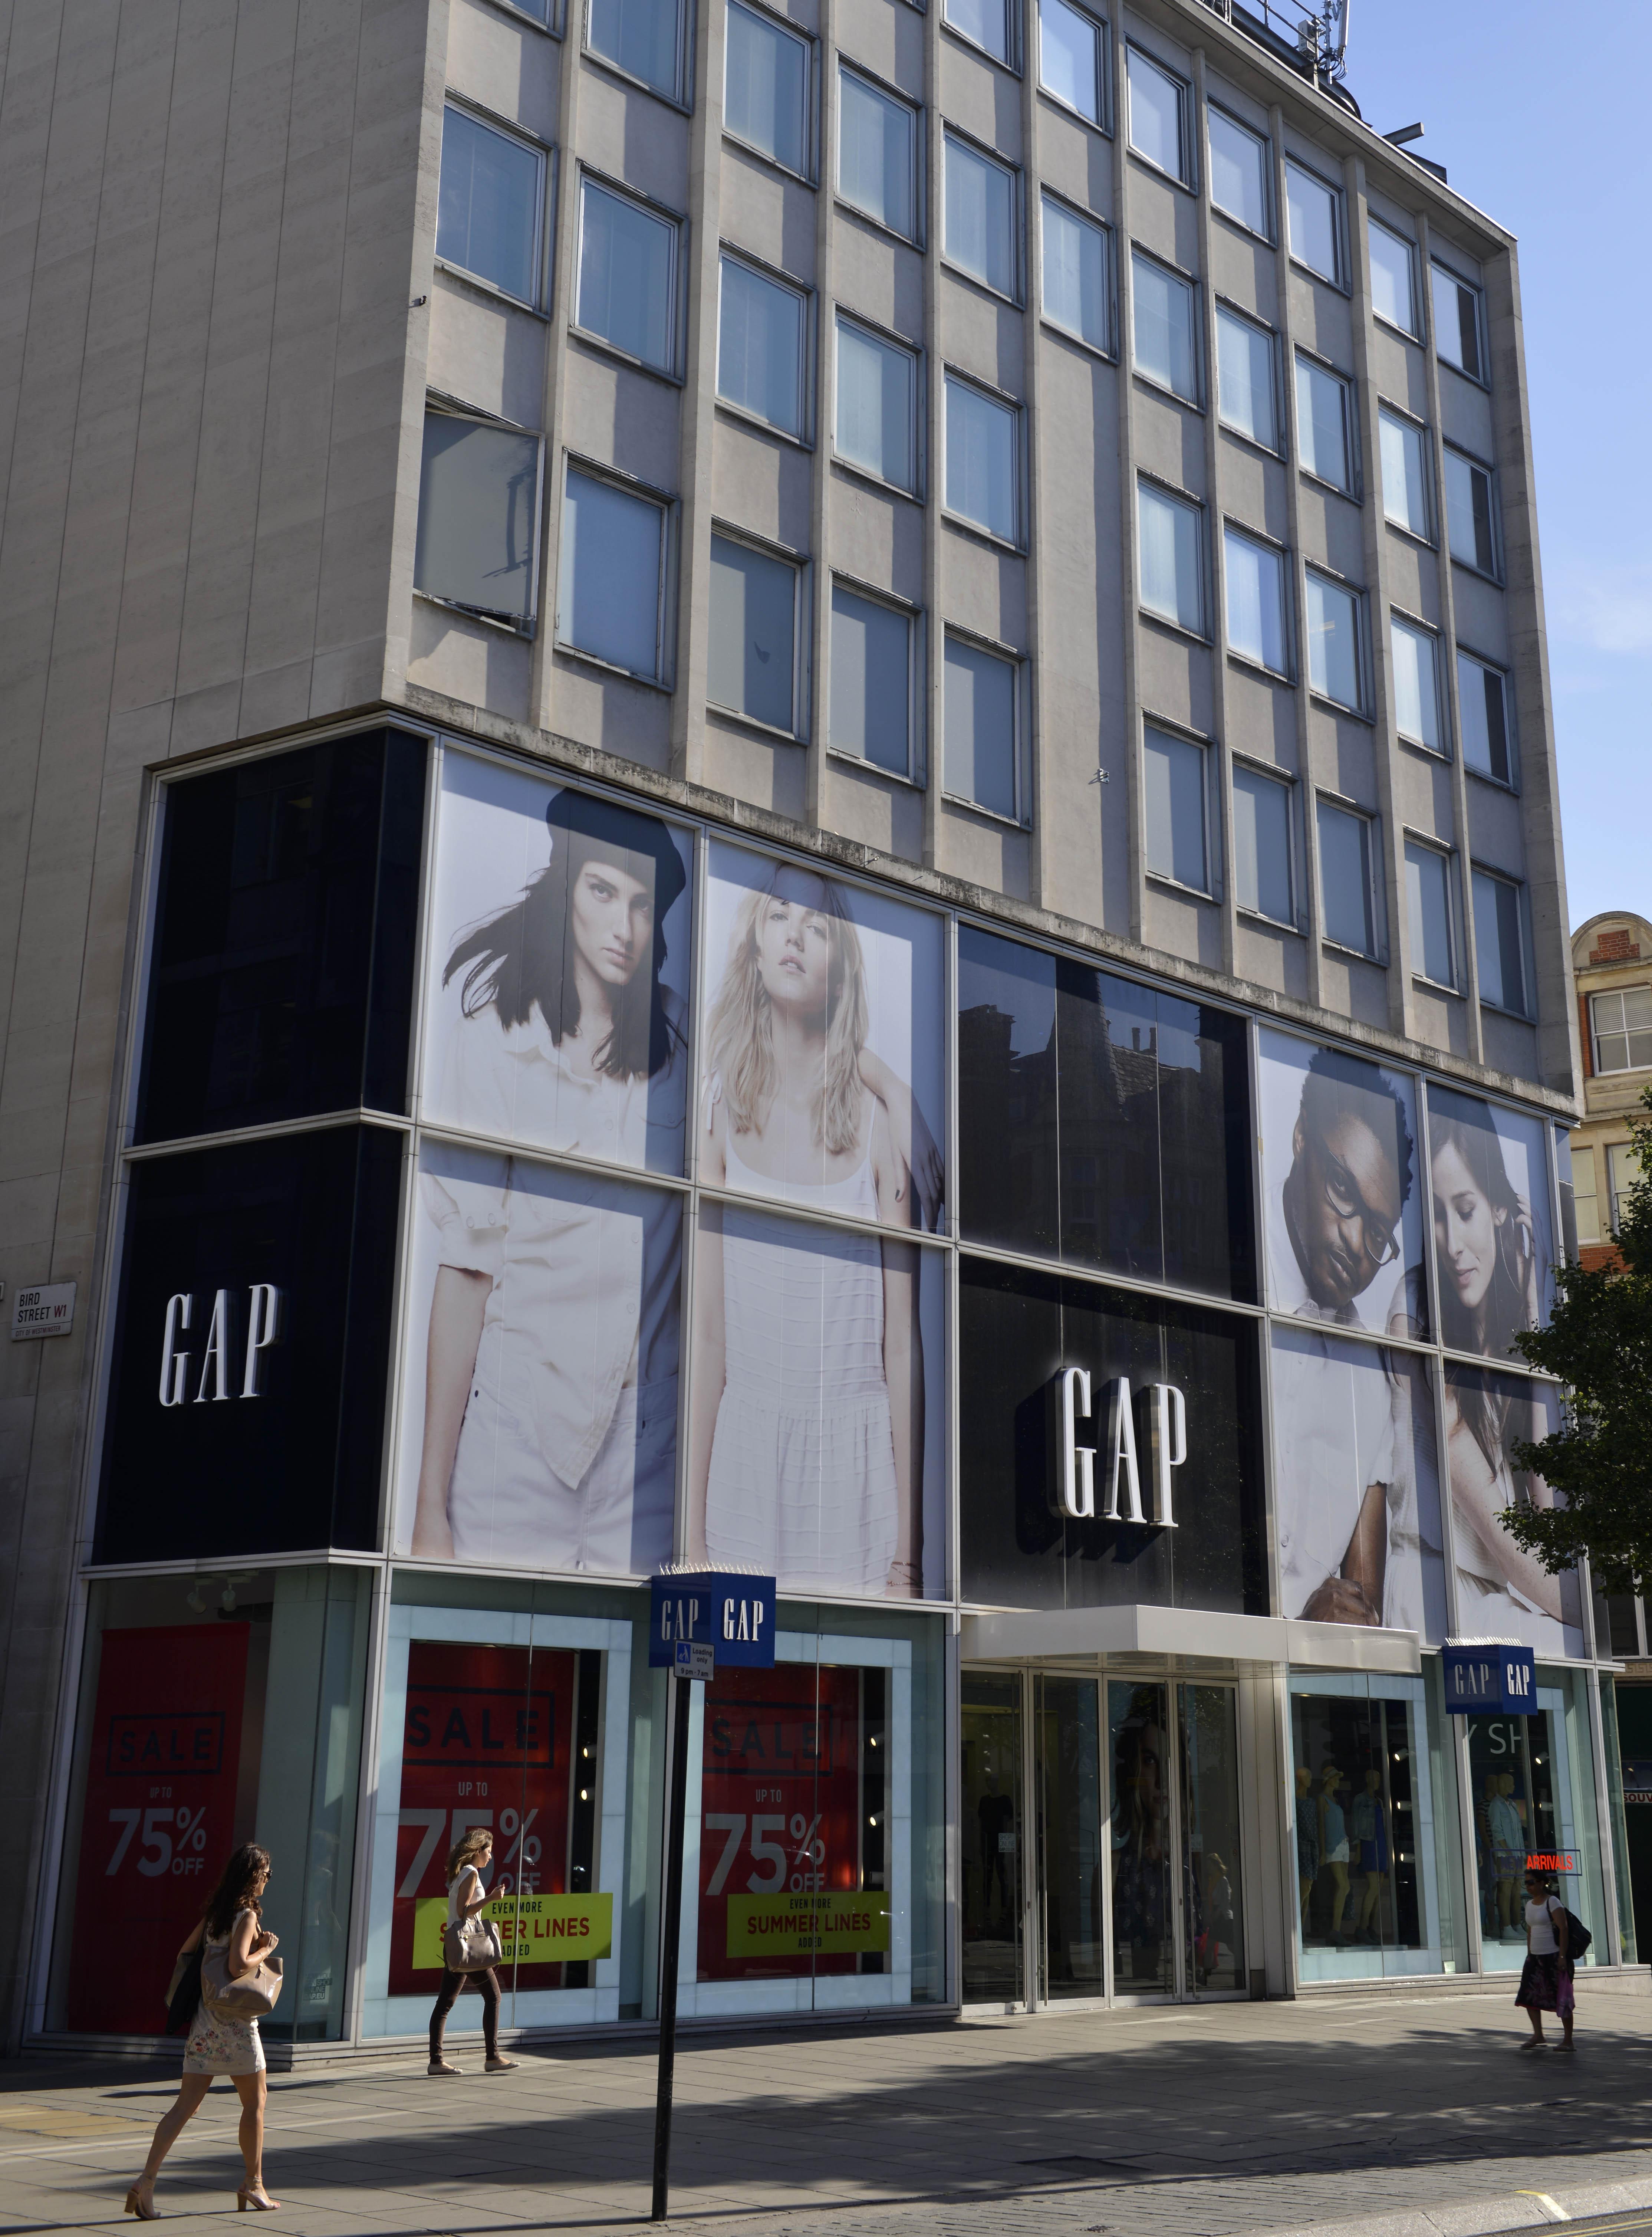 Gap store Oxford Street, London, England, BritainLondon, Britain - Jul 2014